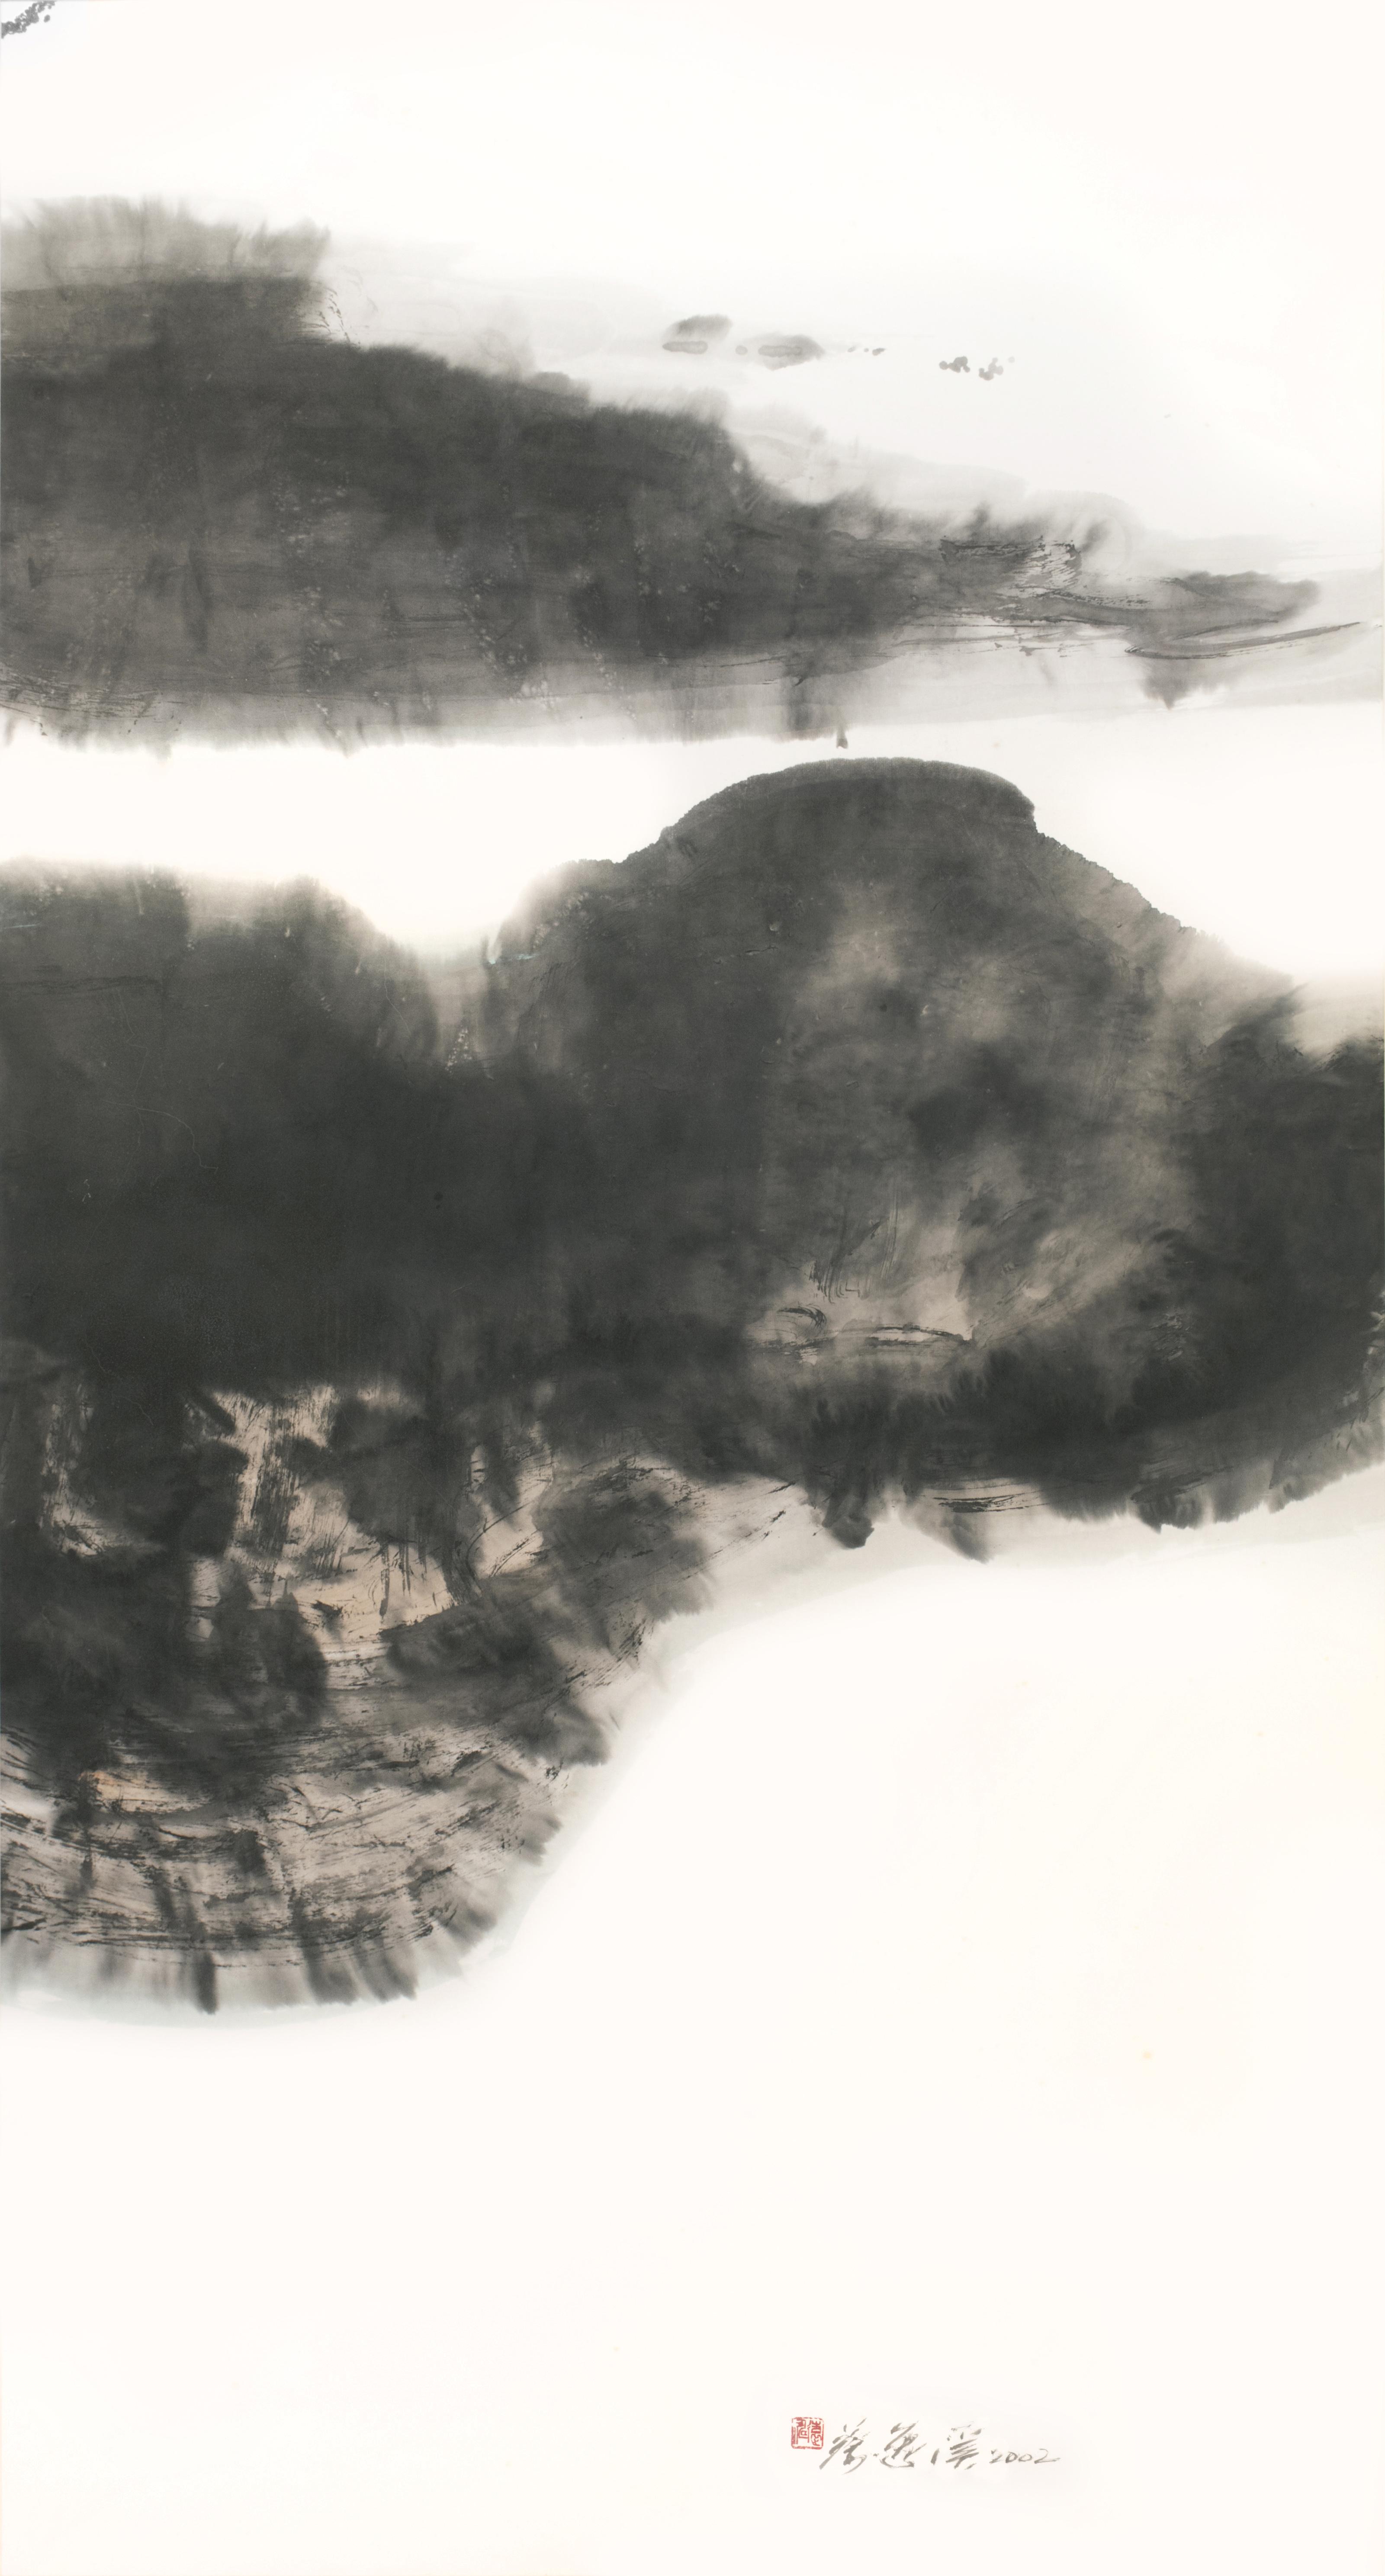 Chua Ek Kay, Archipelago, ink and colour on paper, 151 x 81 cm, 2002